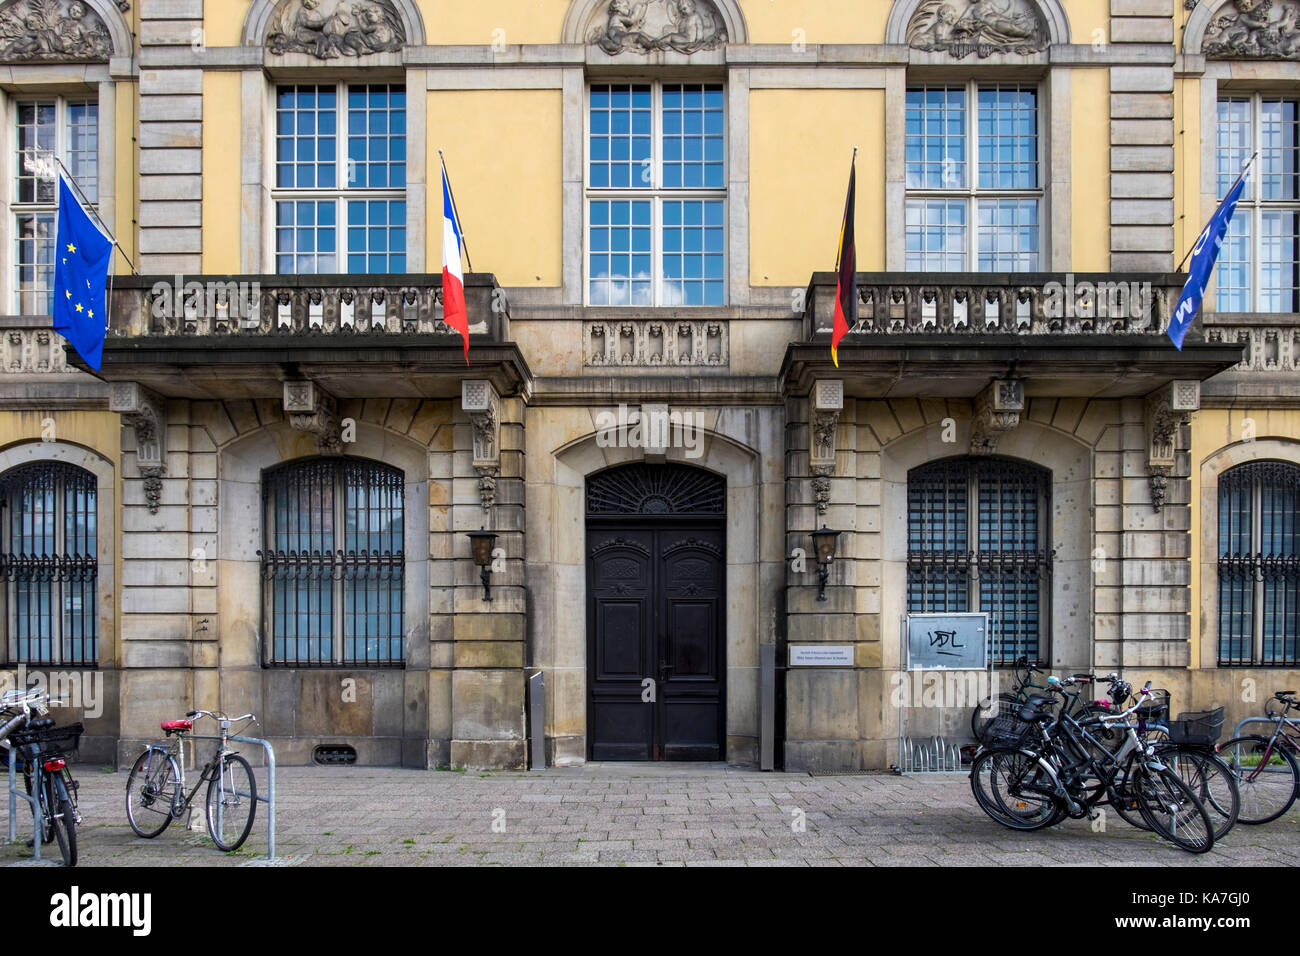 Ufficio In Tedesco : Berlin mitte antico edificio storico alloggiamento tedesco